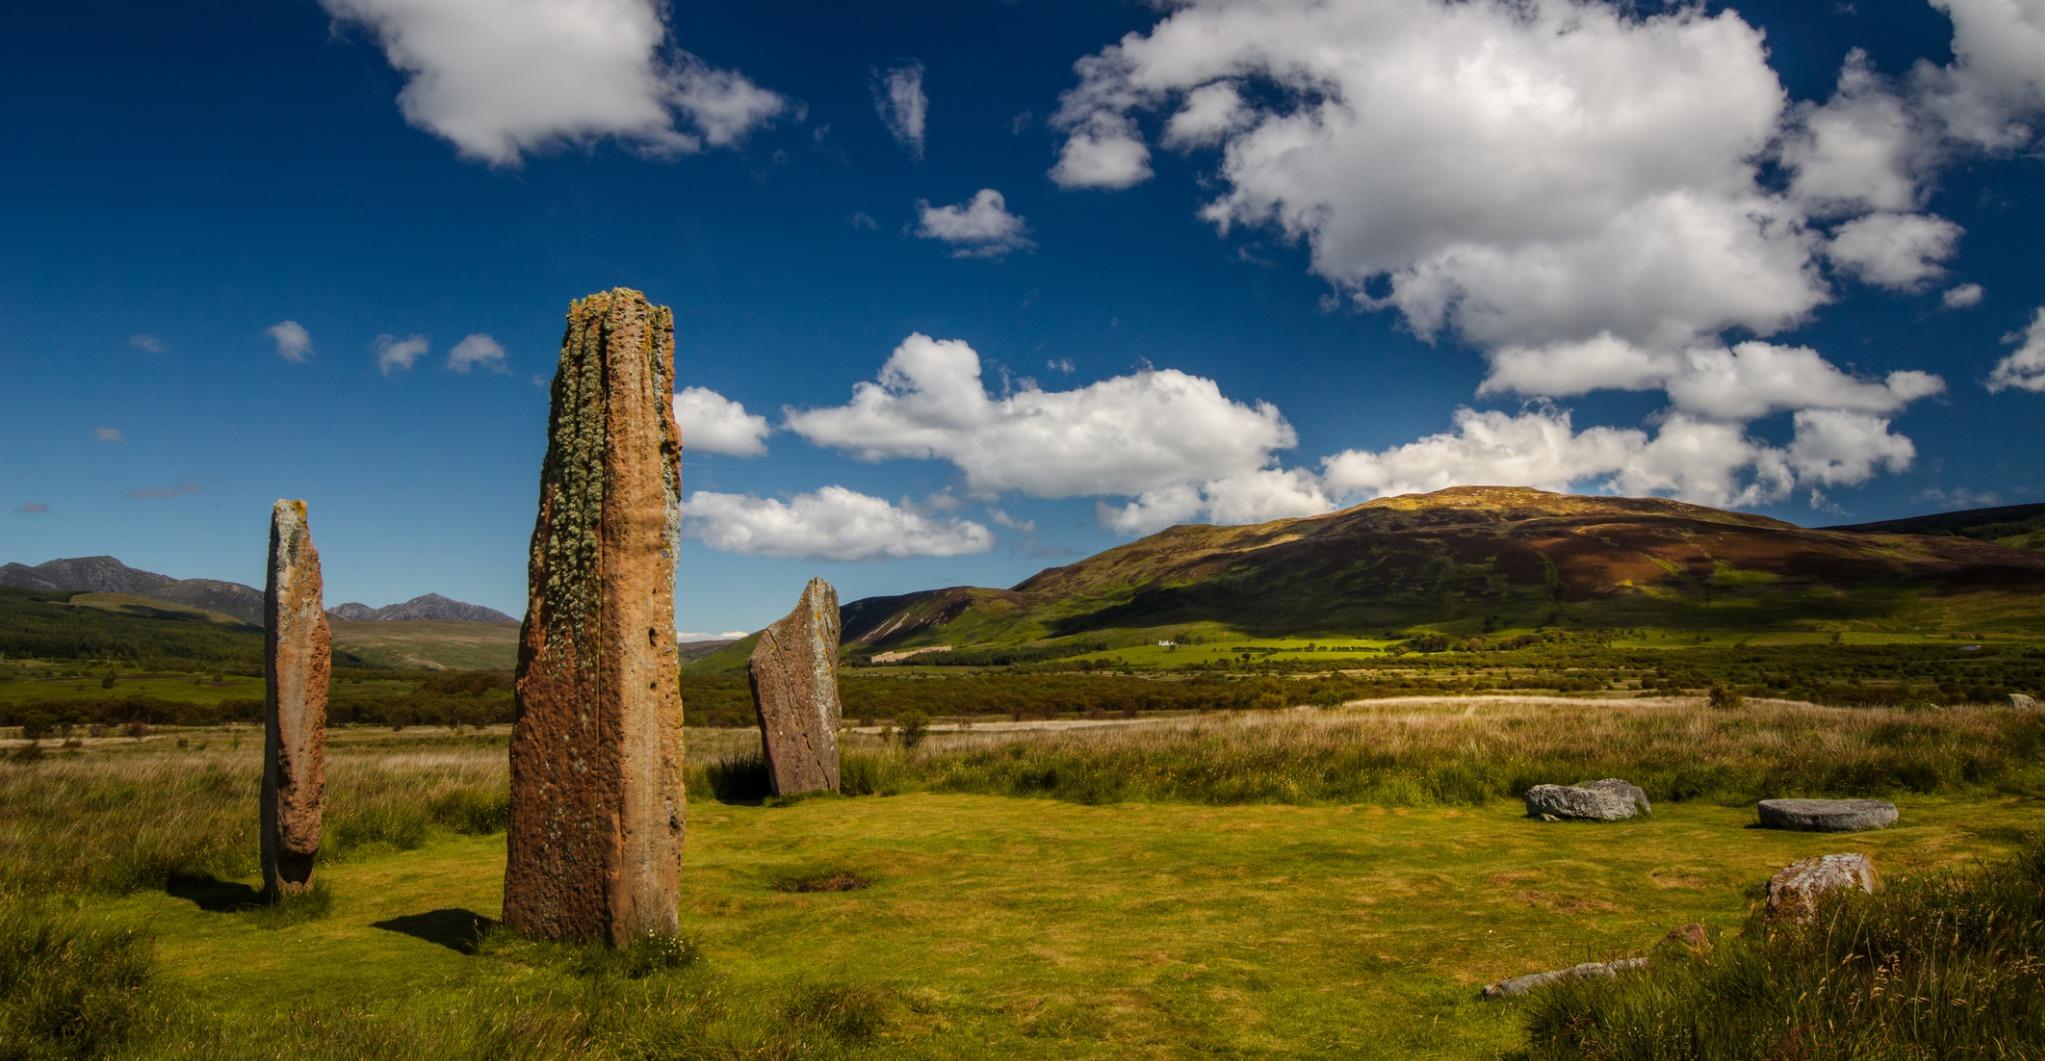 Machrie Moor stones on the Isle of Arran